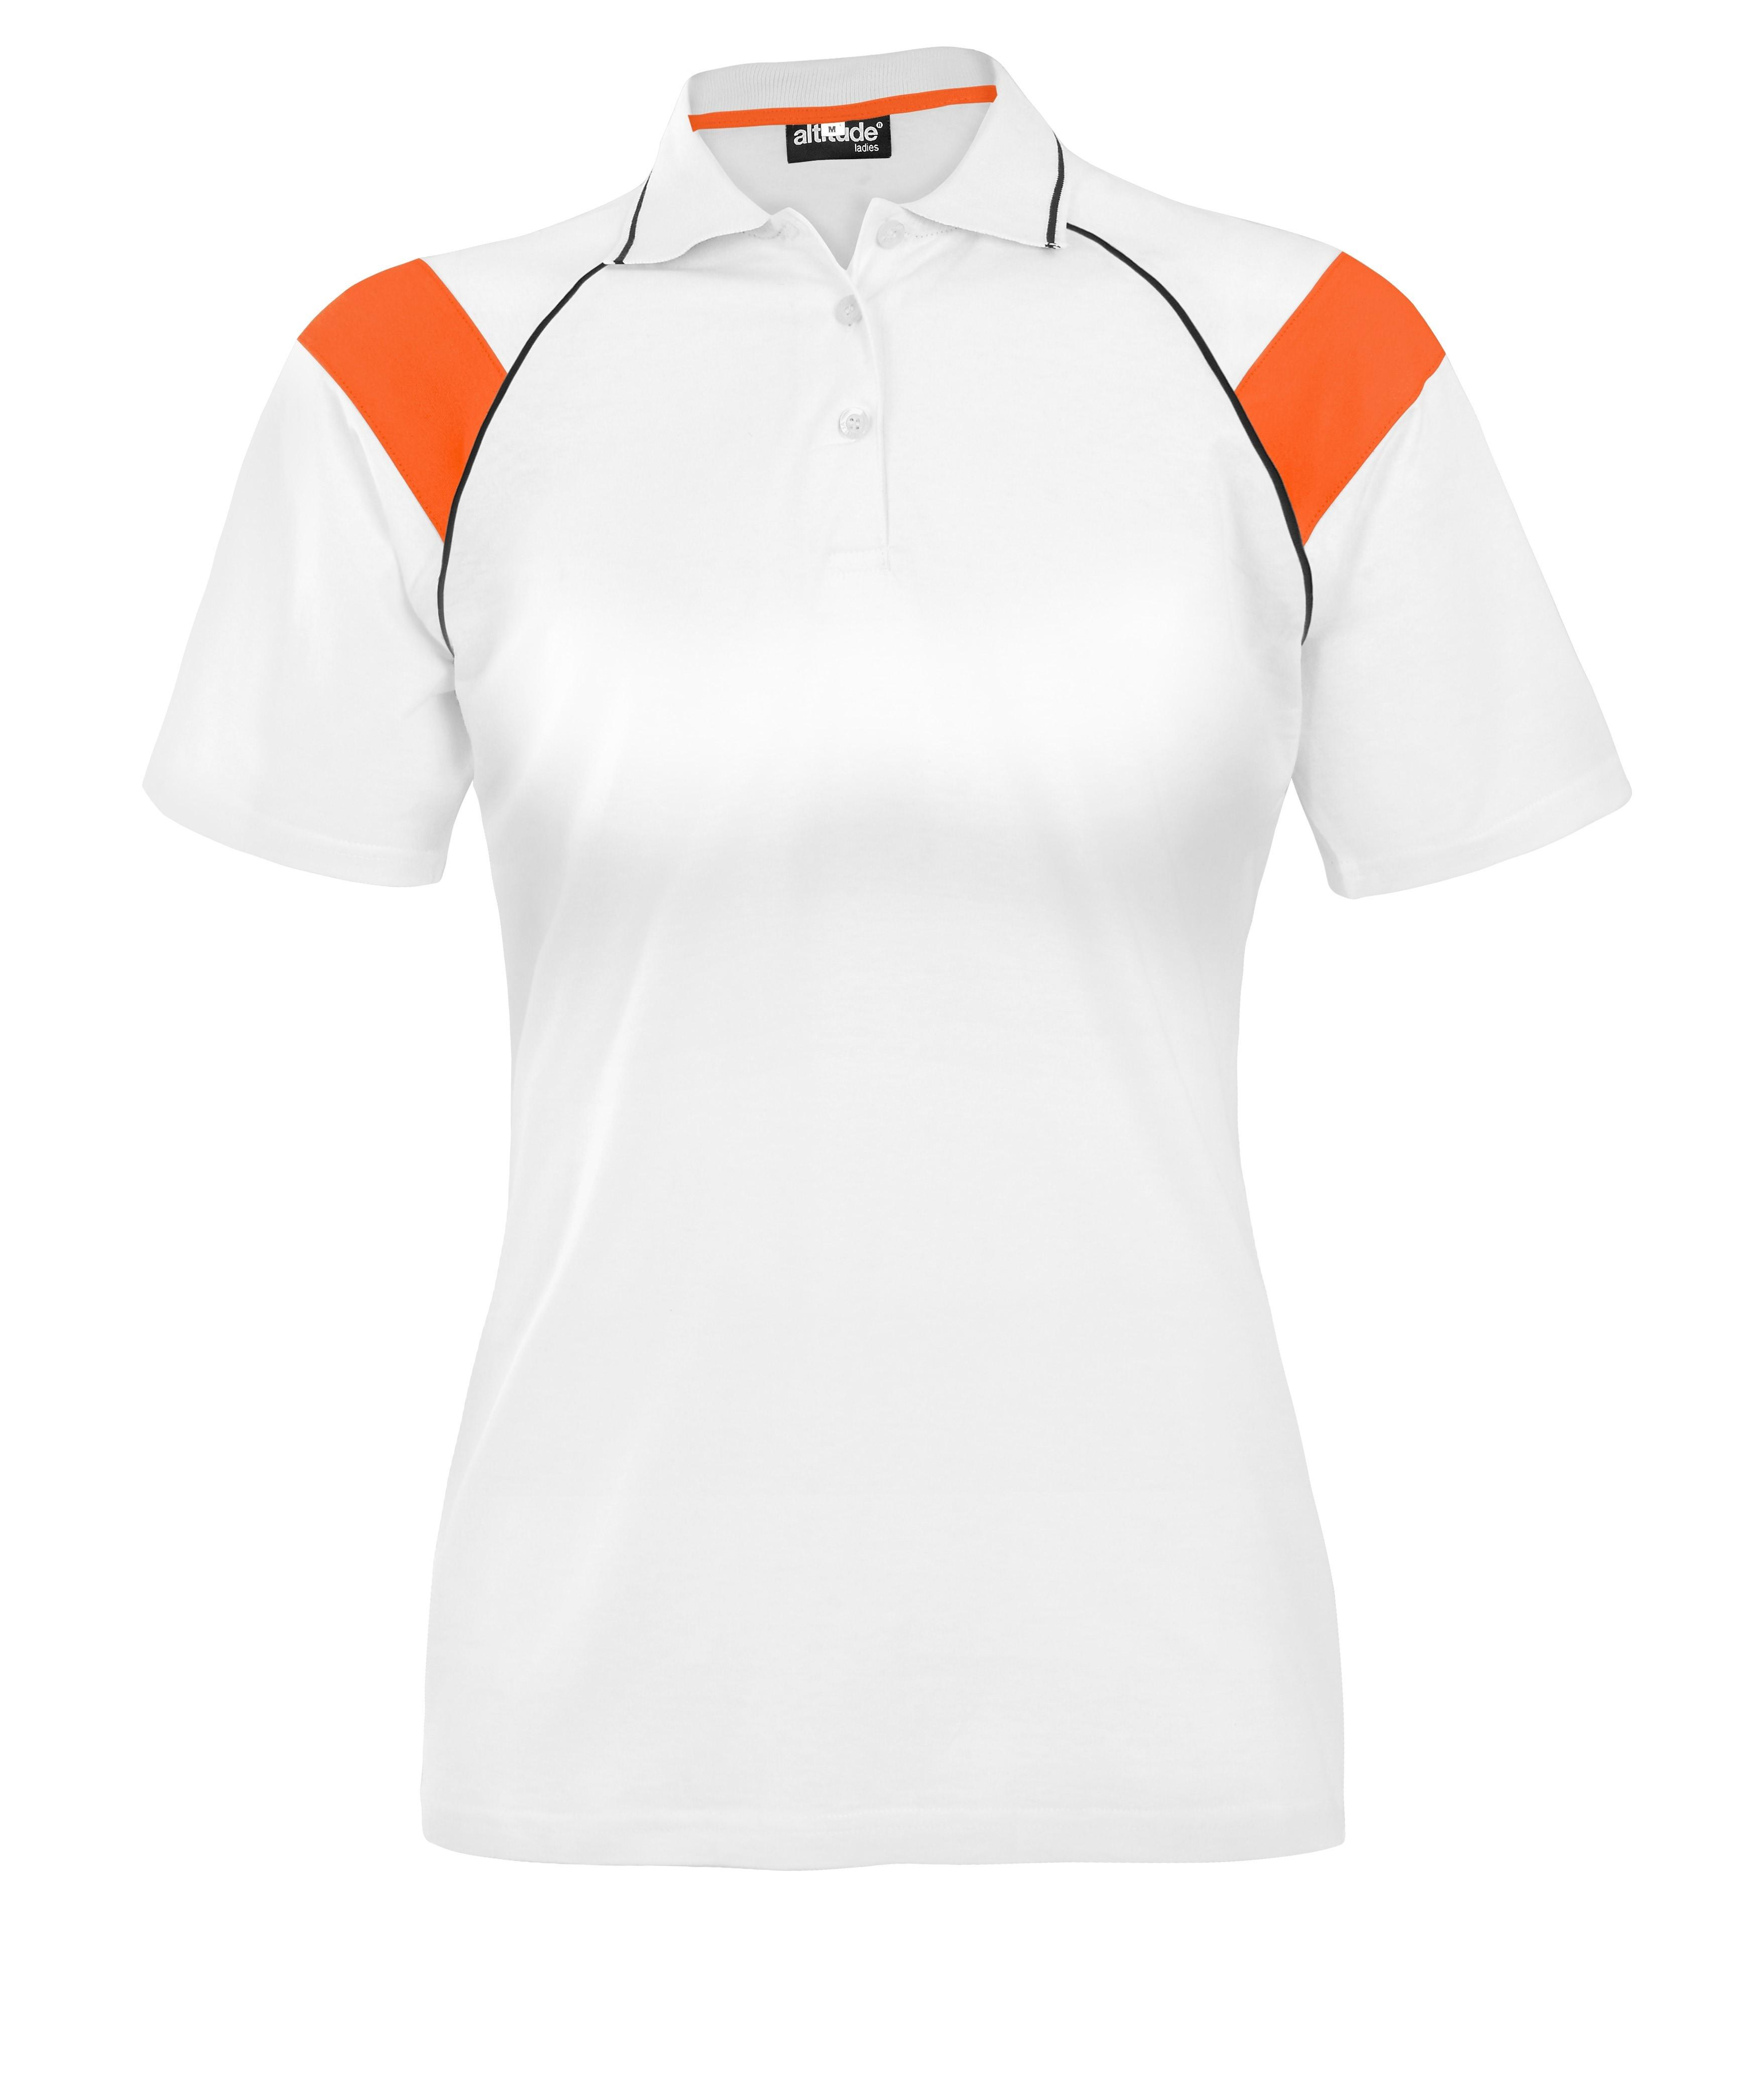 Ladies Score Golf Shirt - Orange Only